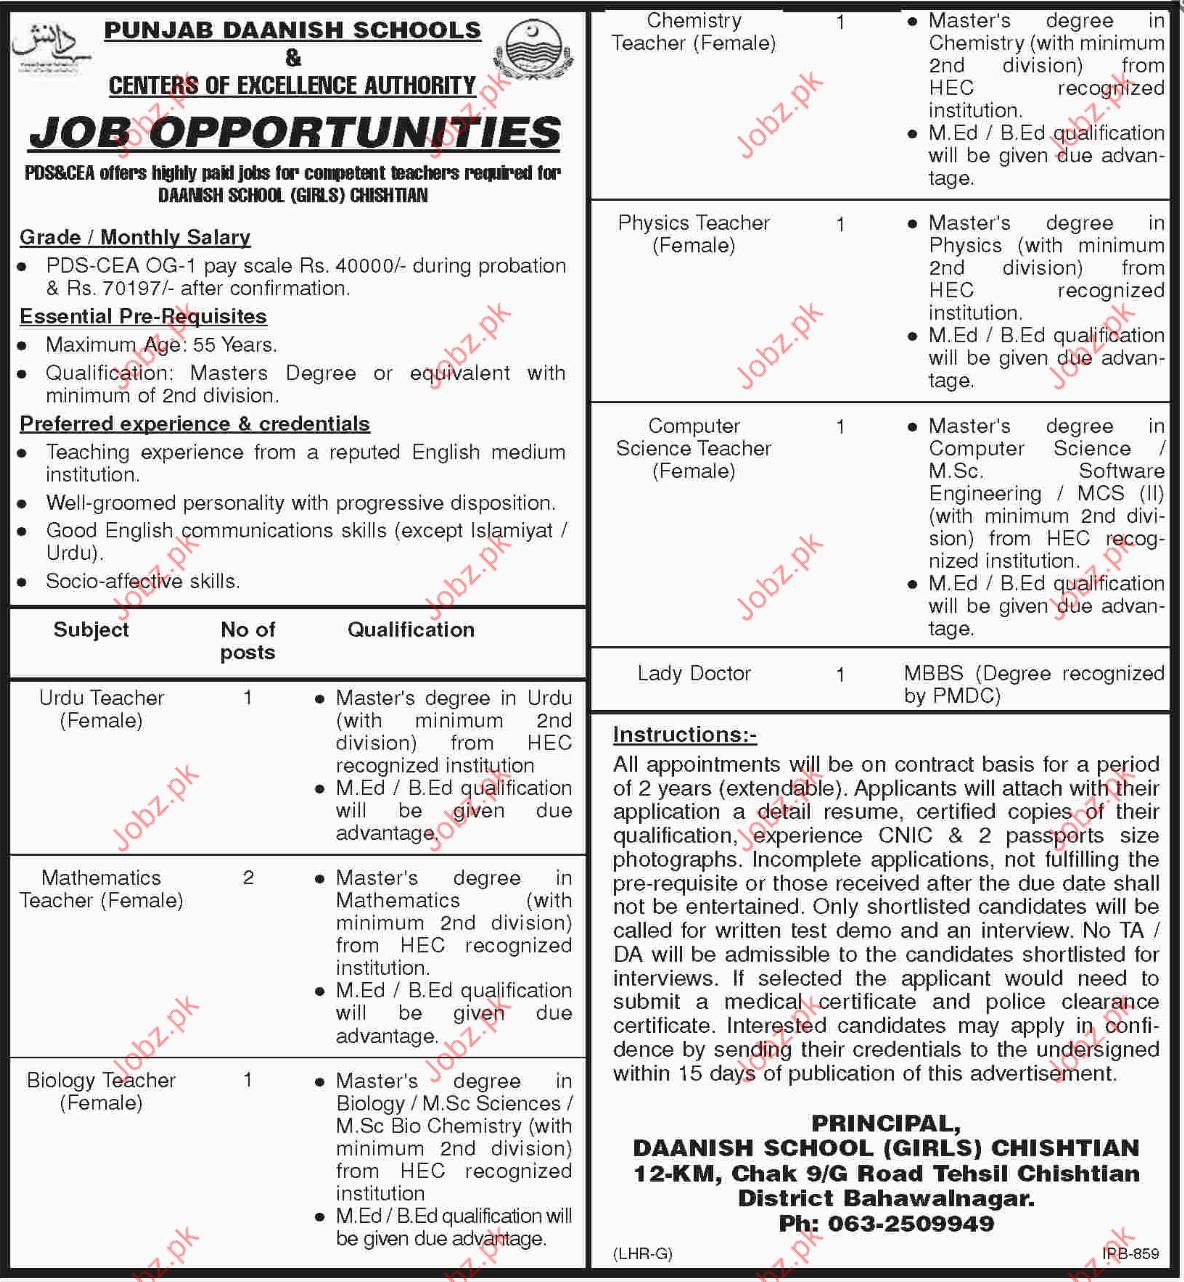 Punjab Danish School Job Opportunities